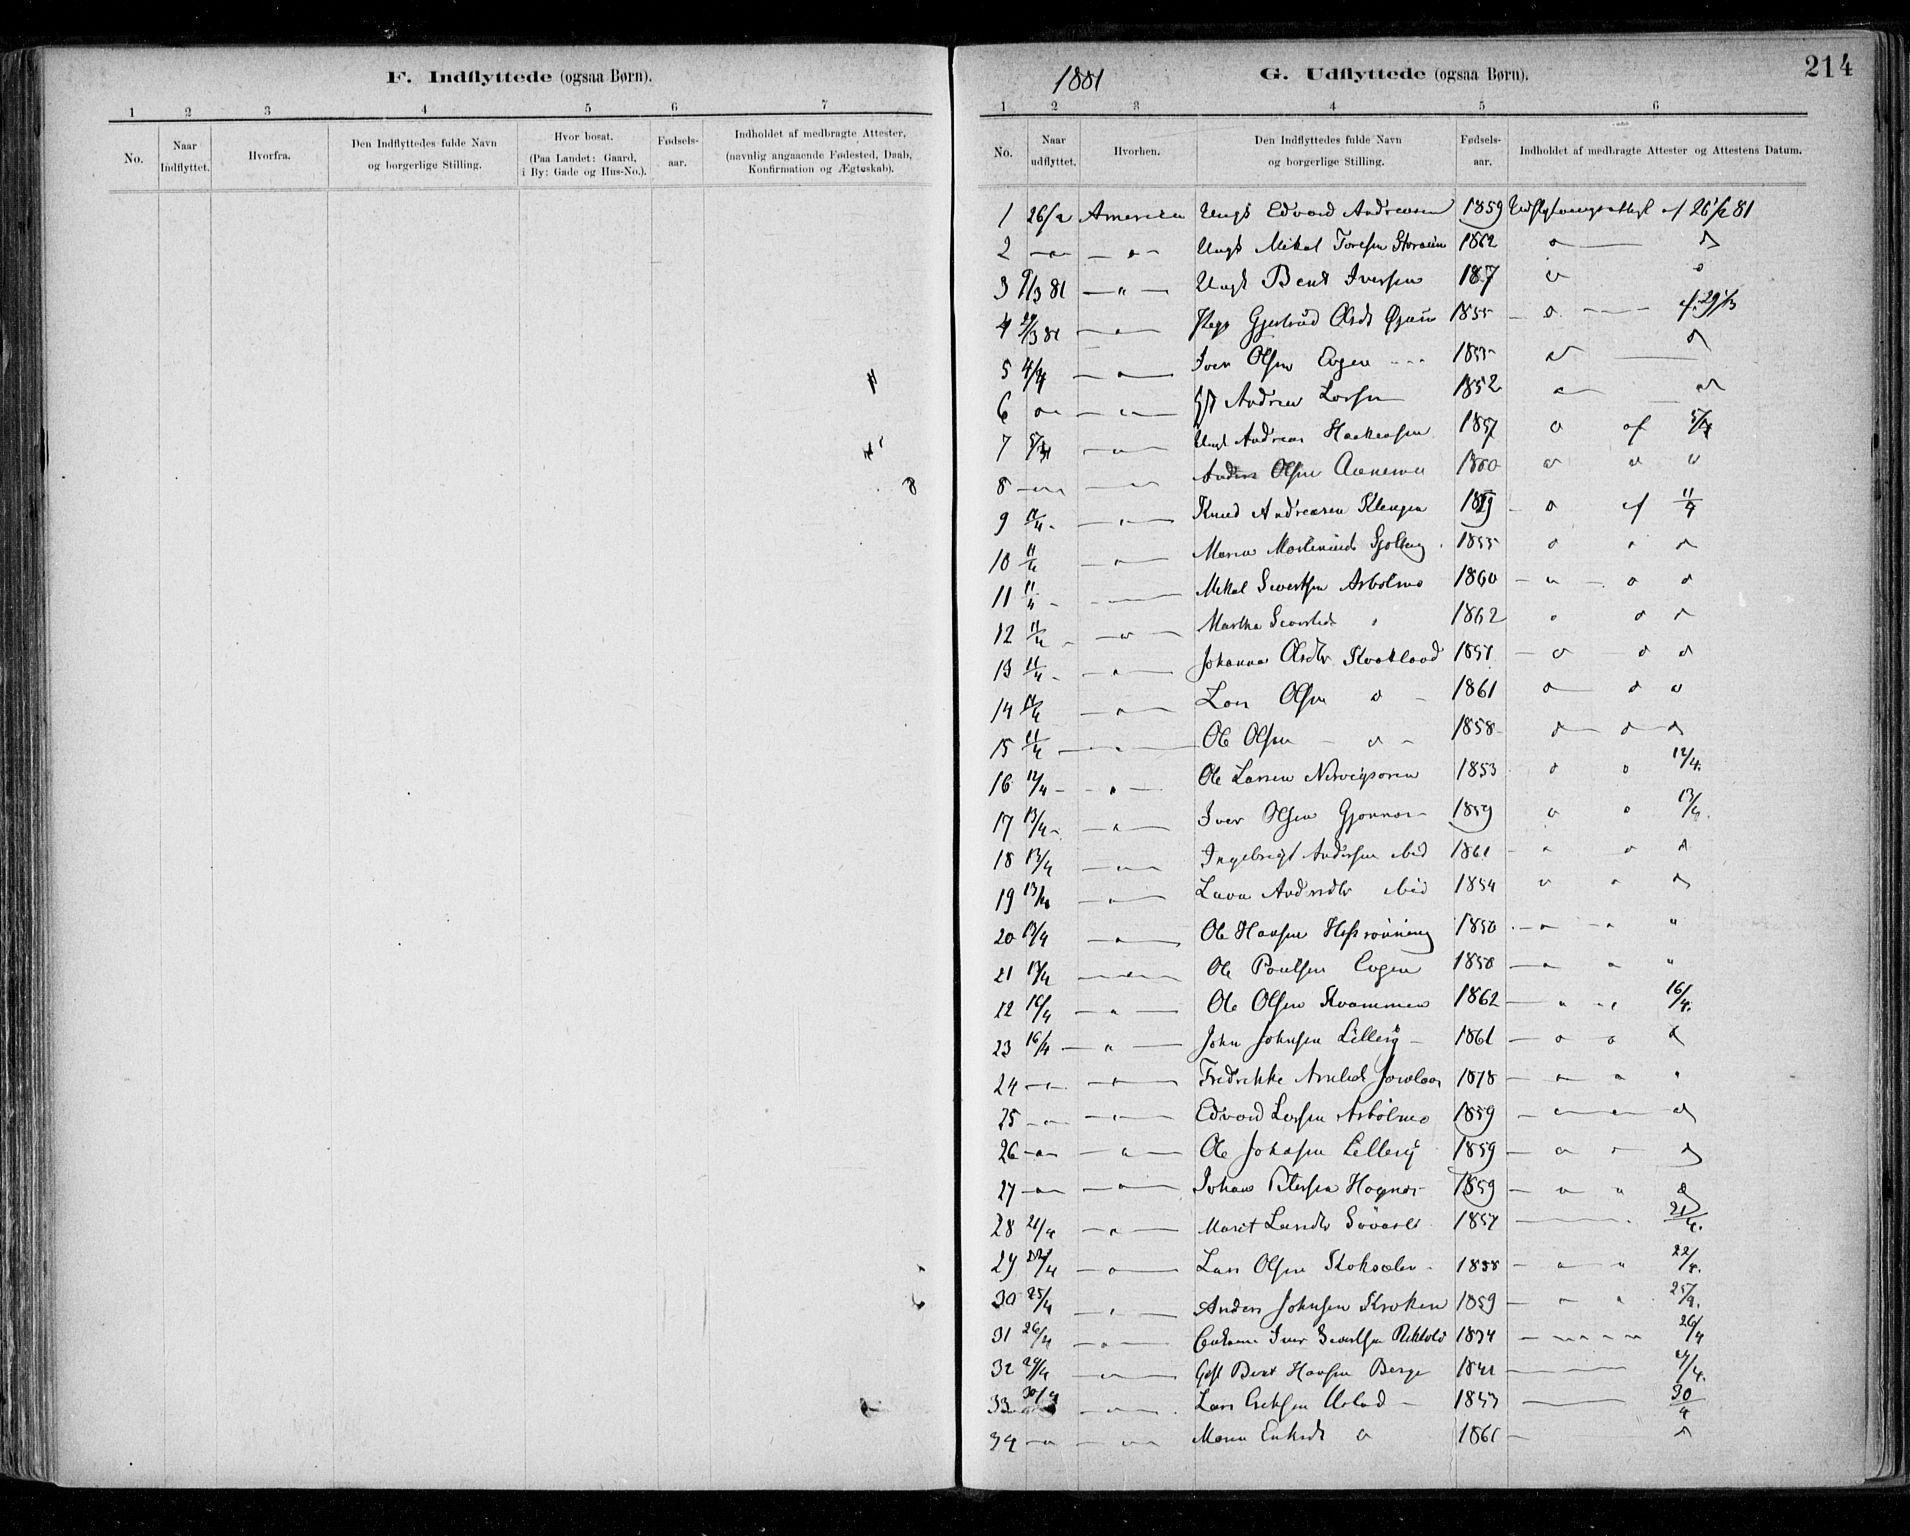 SAT, Ministerialprotokoller, klokkerbøker og fødselsregistre - Sør-Trøndelag, 668/L0810: Parish register (official) no. 668A10, 1881-1894, p. 214